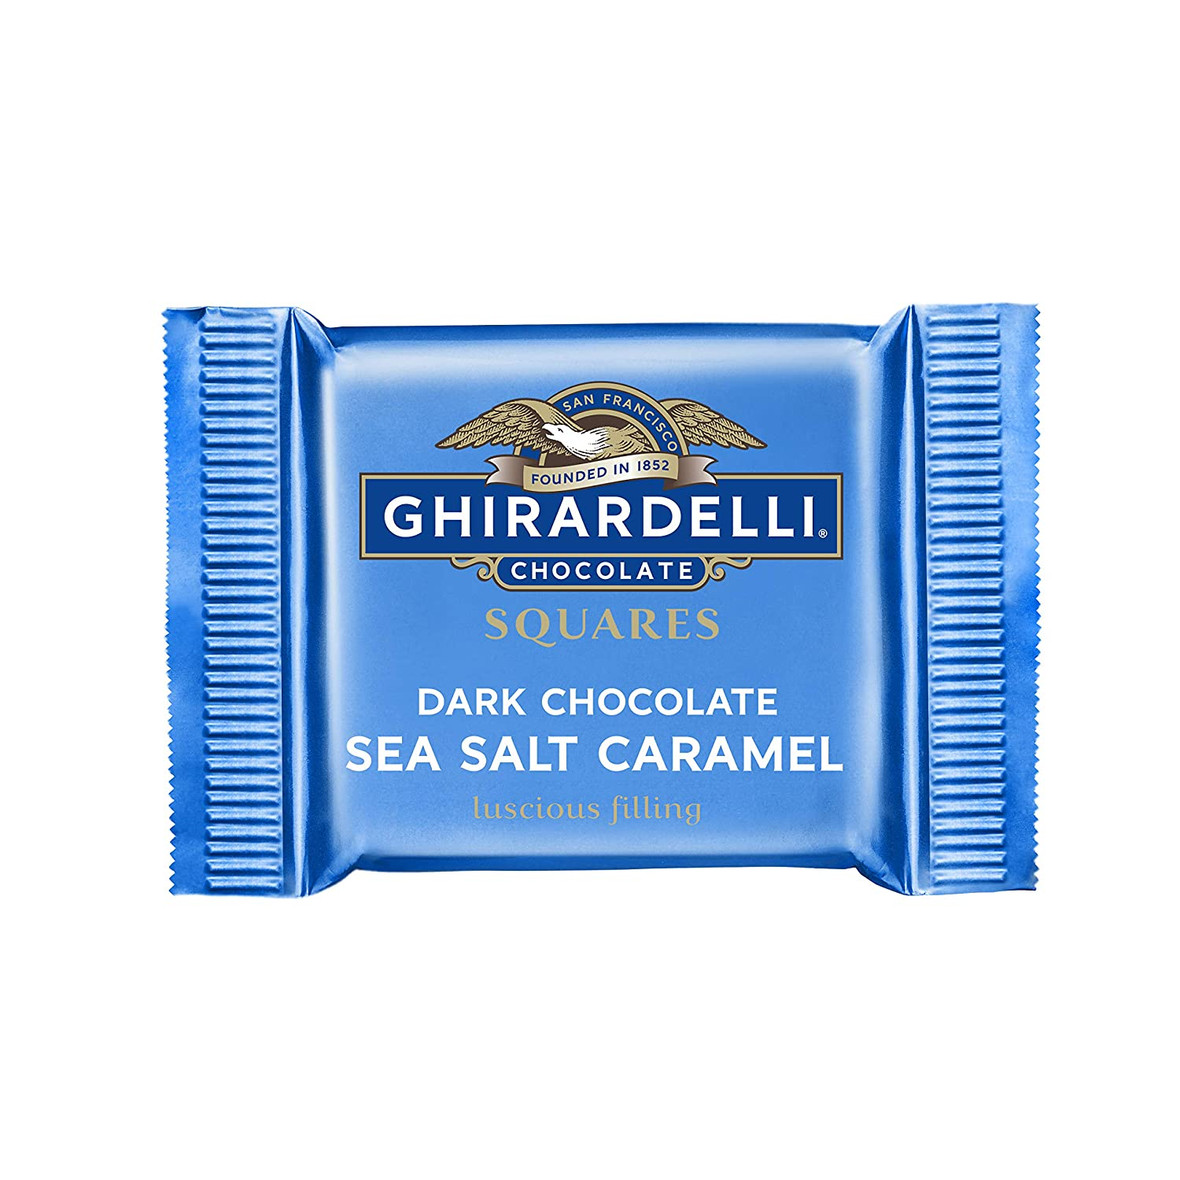 Ghirardelli Dark Chocolate Sea Salt Caramel Squares .53 Oz (Pack of 660)